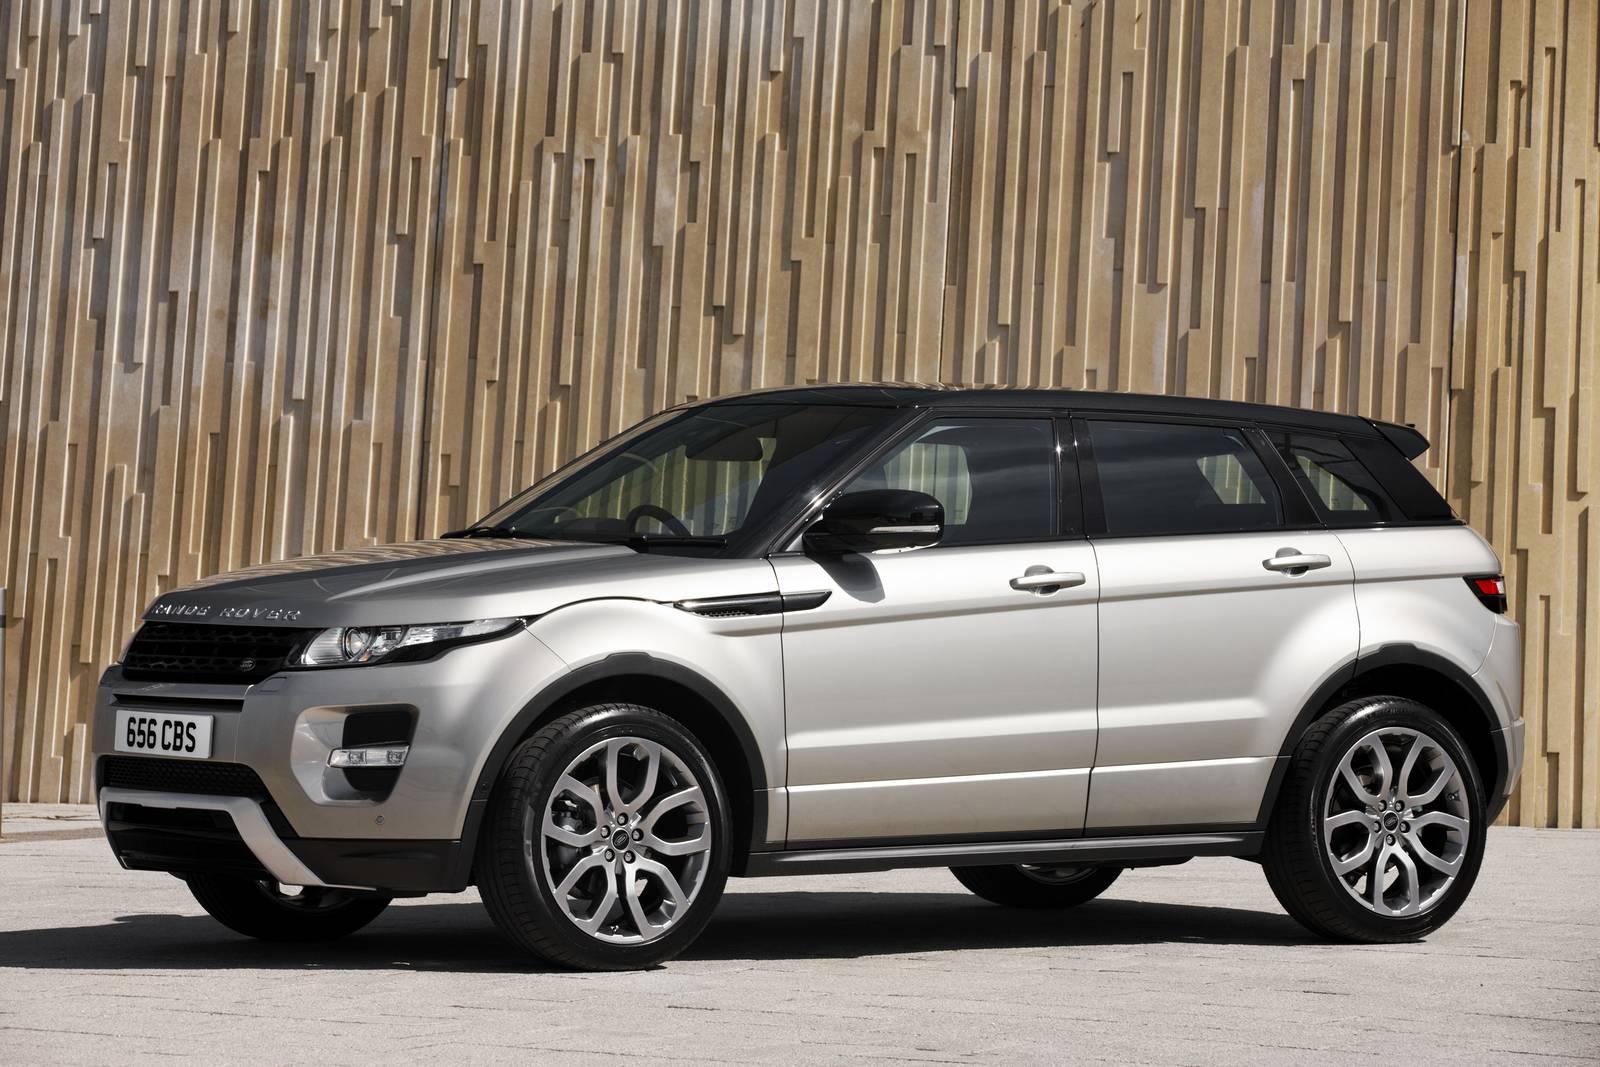 jaguar land rover embarks on new hybrid and battery electric vehicle bev technologies gtspirit. Black Bedroom Furniture Sets. Home Design Ideas